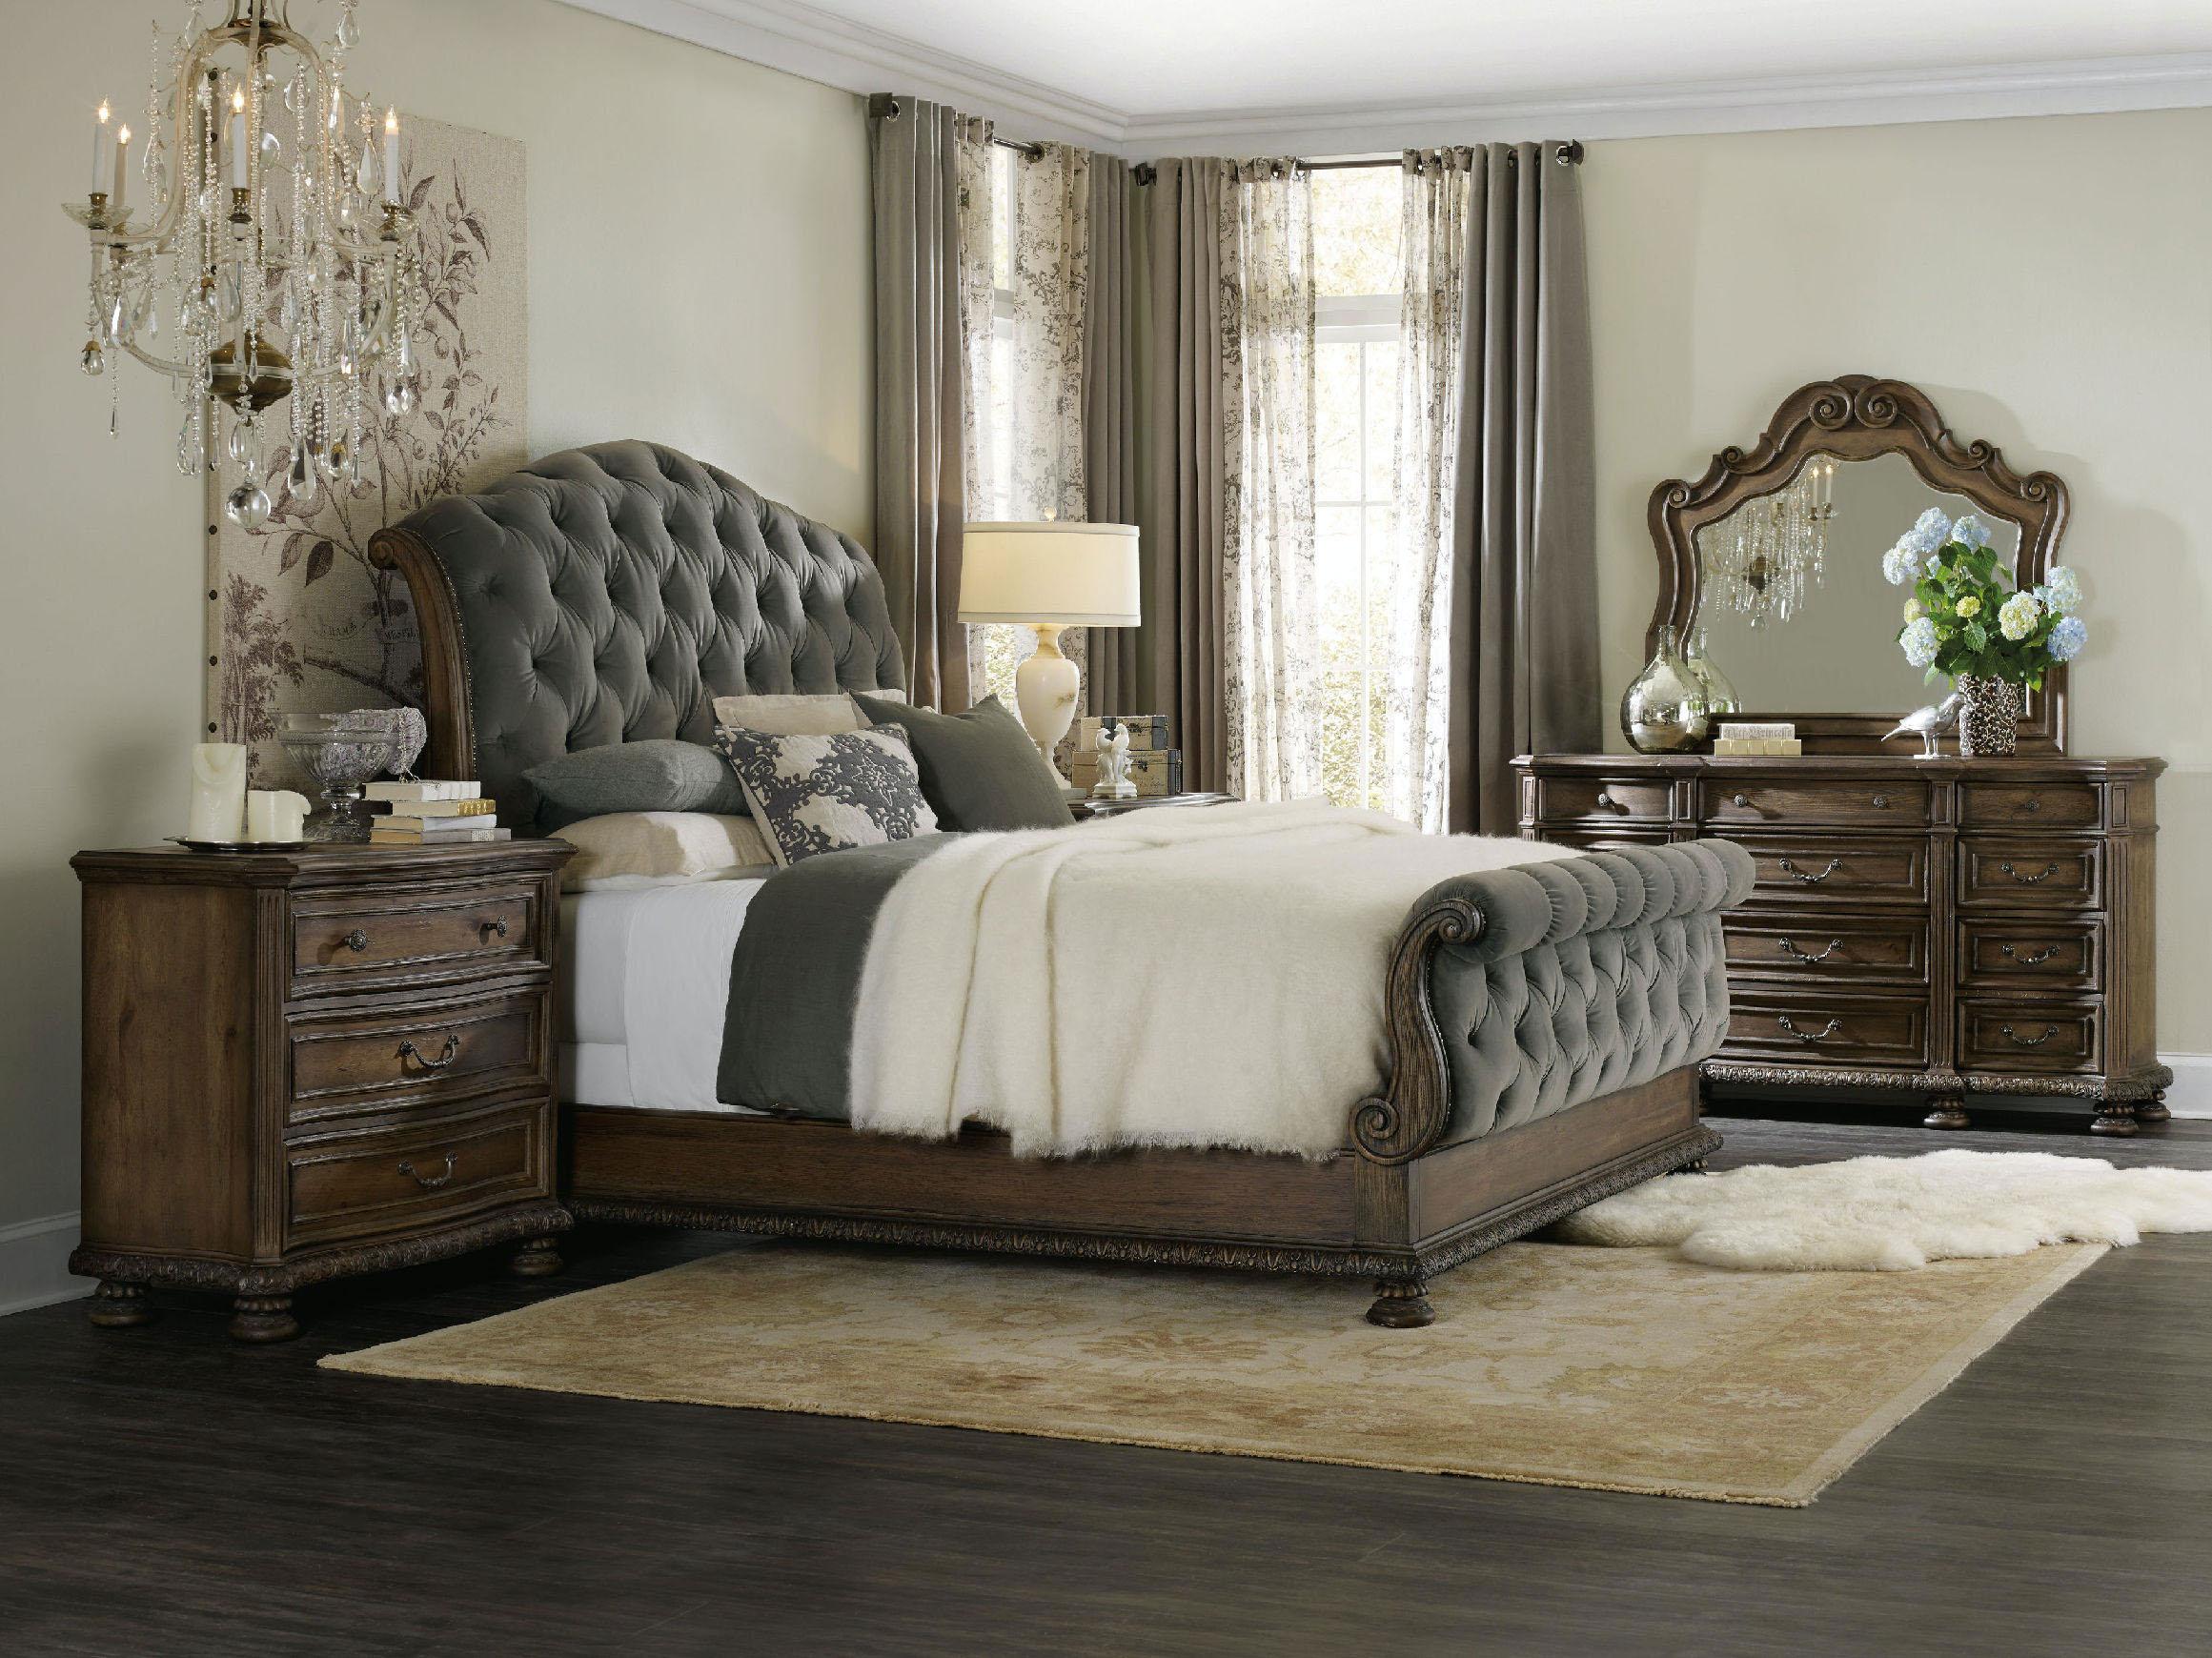 brown classic style capitone grey fabric bed with high headboard and brown legs, klassiko kapitone krevati me xilina podia kai klassiko design,